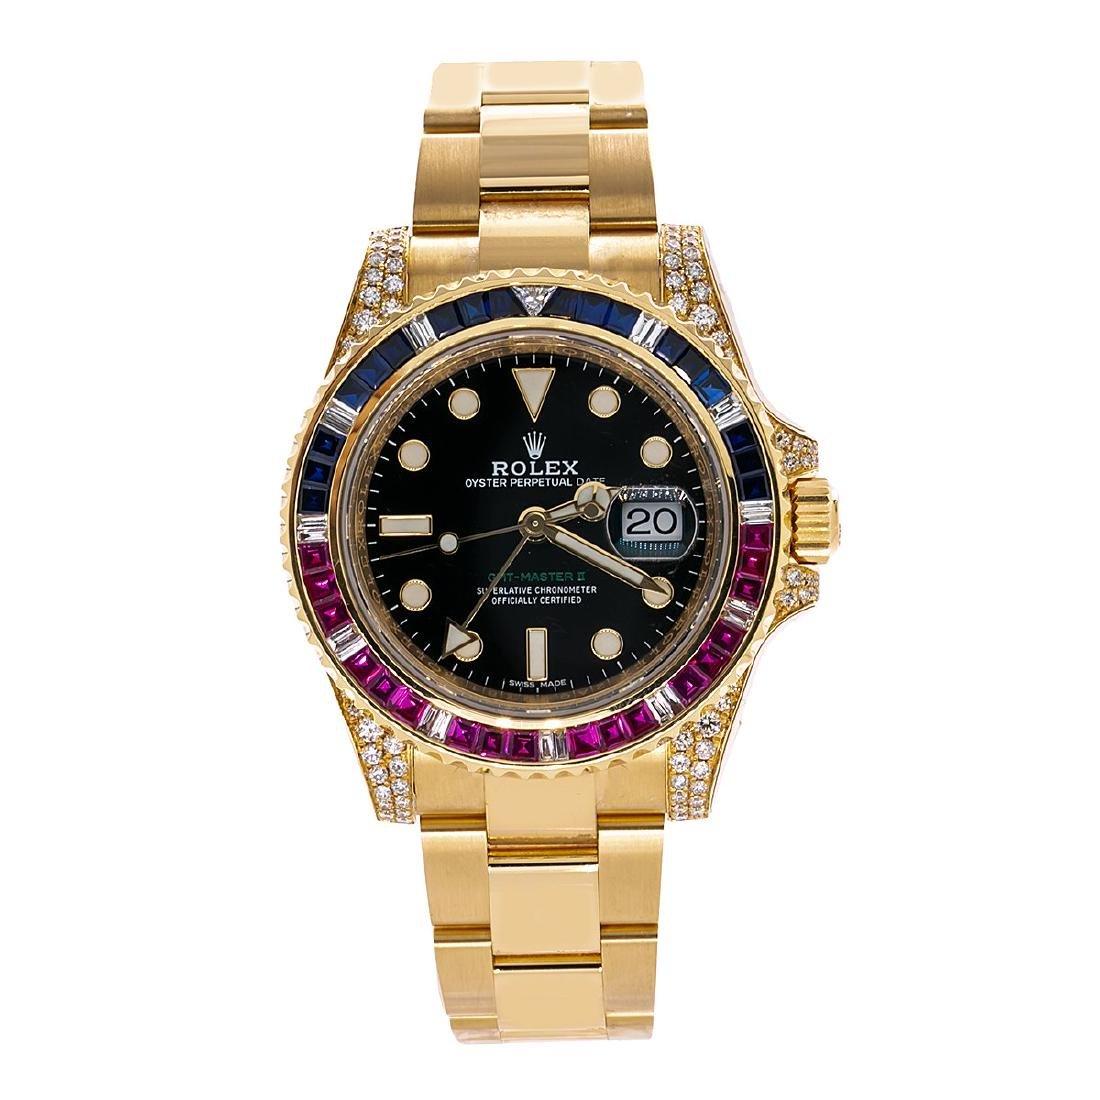 18K YELLOW GOLD ROLEX GMT MASTER II 116718 40MM BLACK